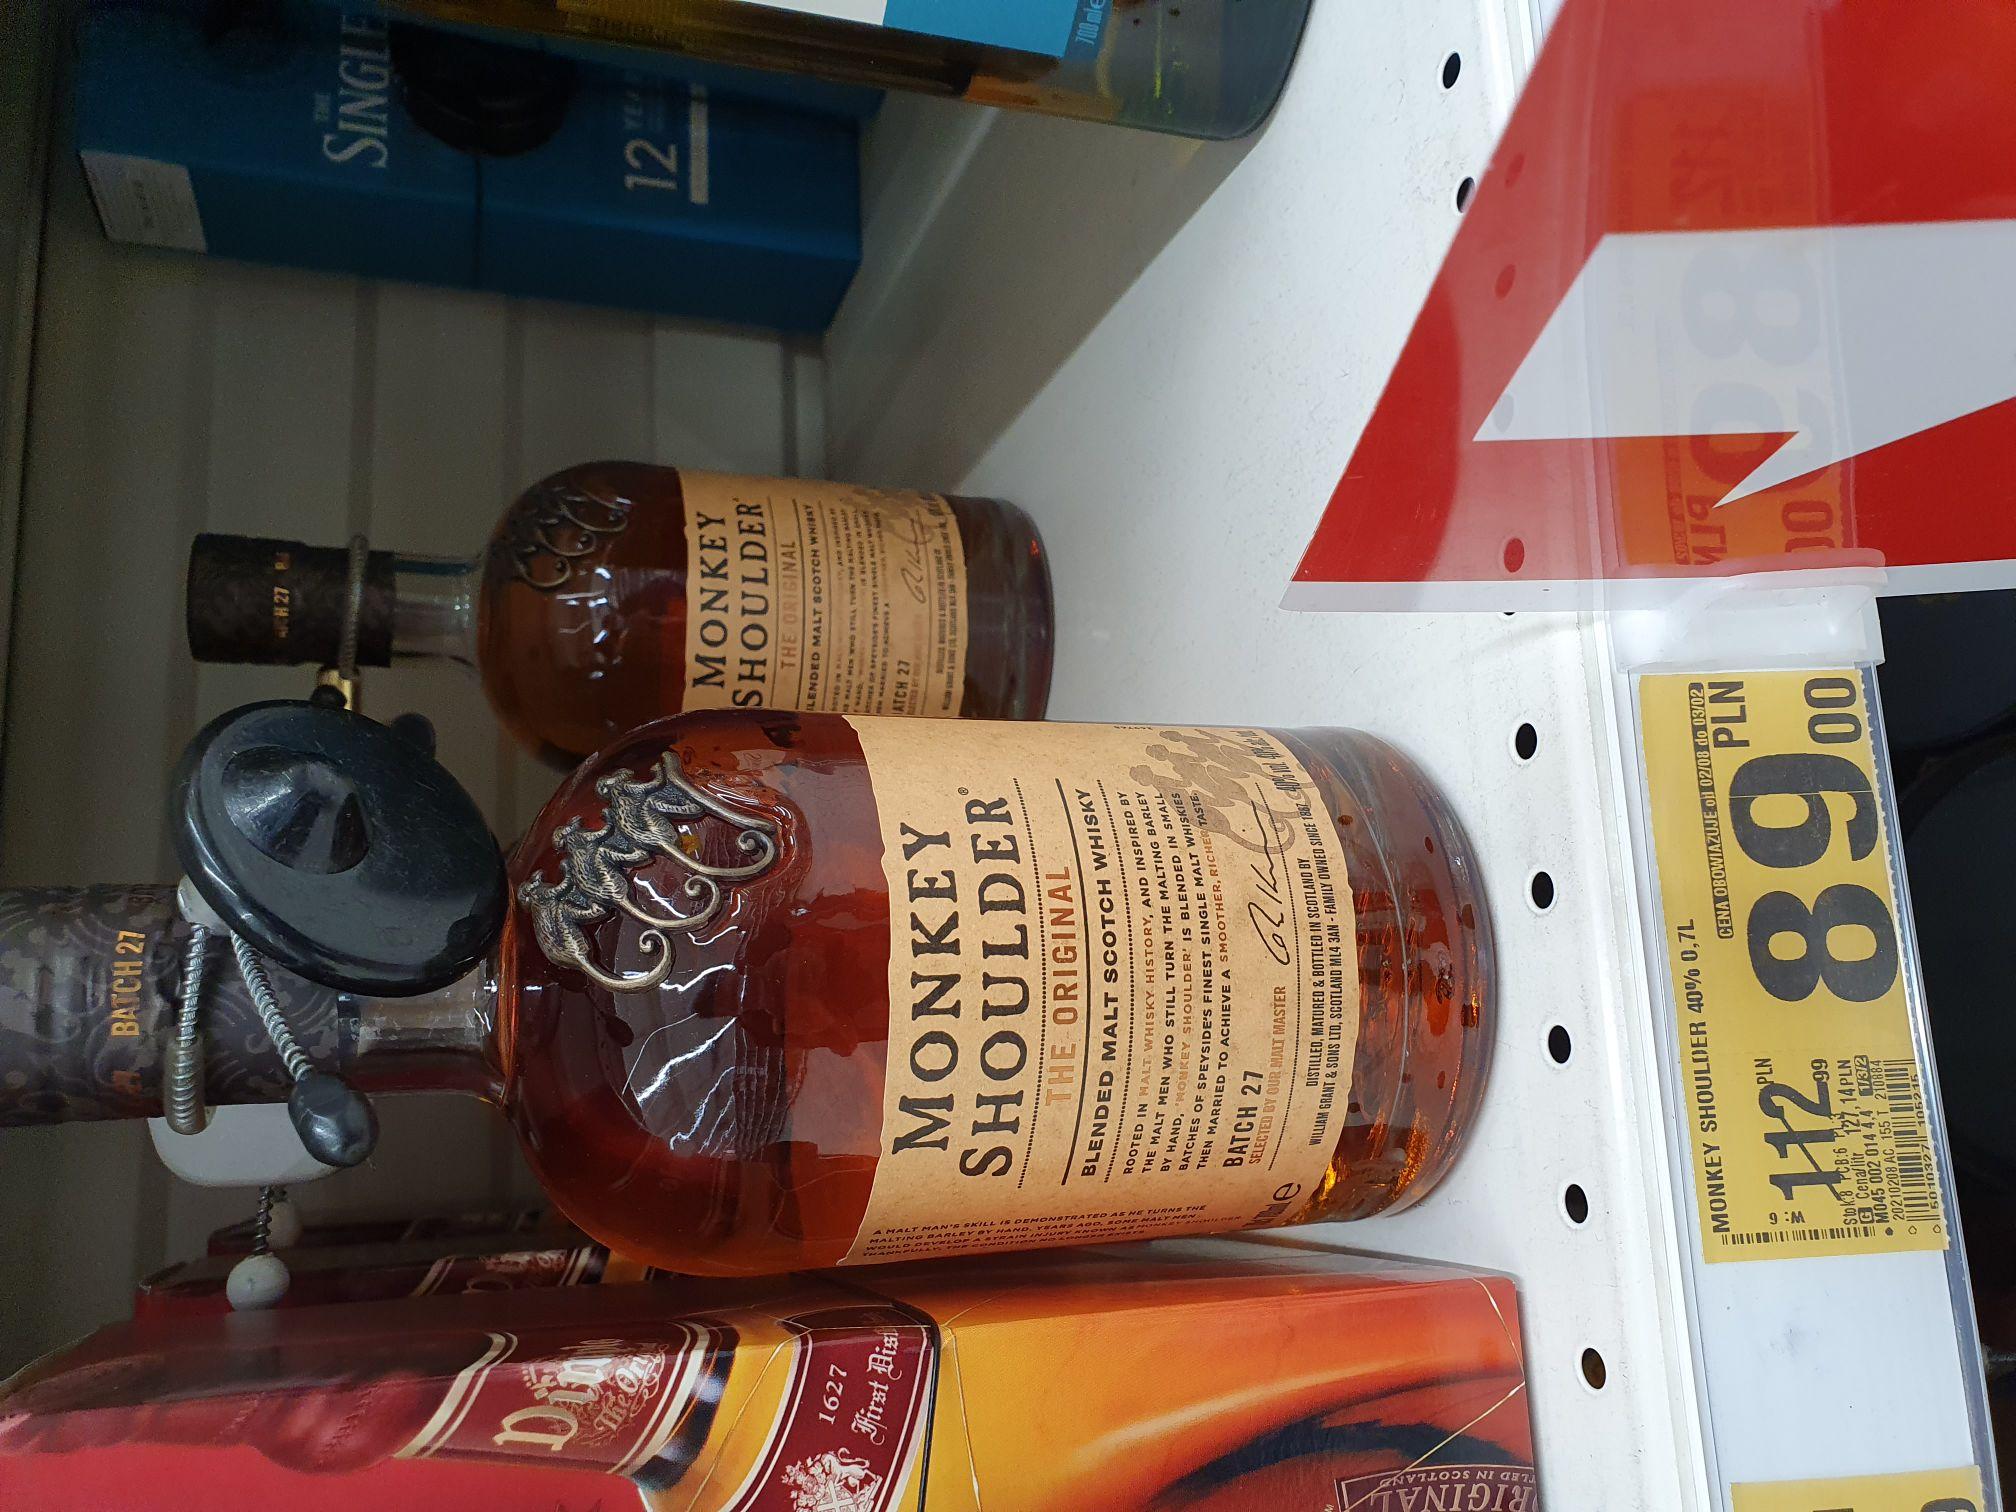 Monkey Shoulder Blended Malt Whisky 0,7l Auchan Janki